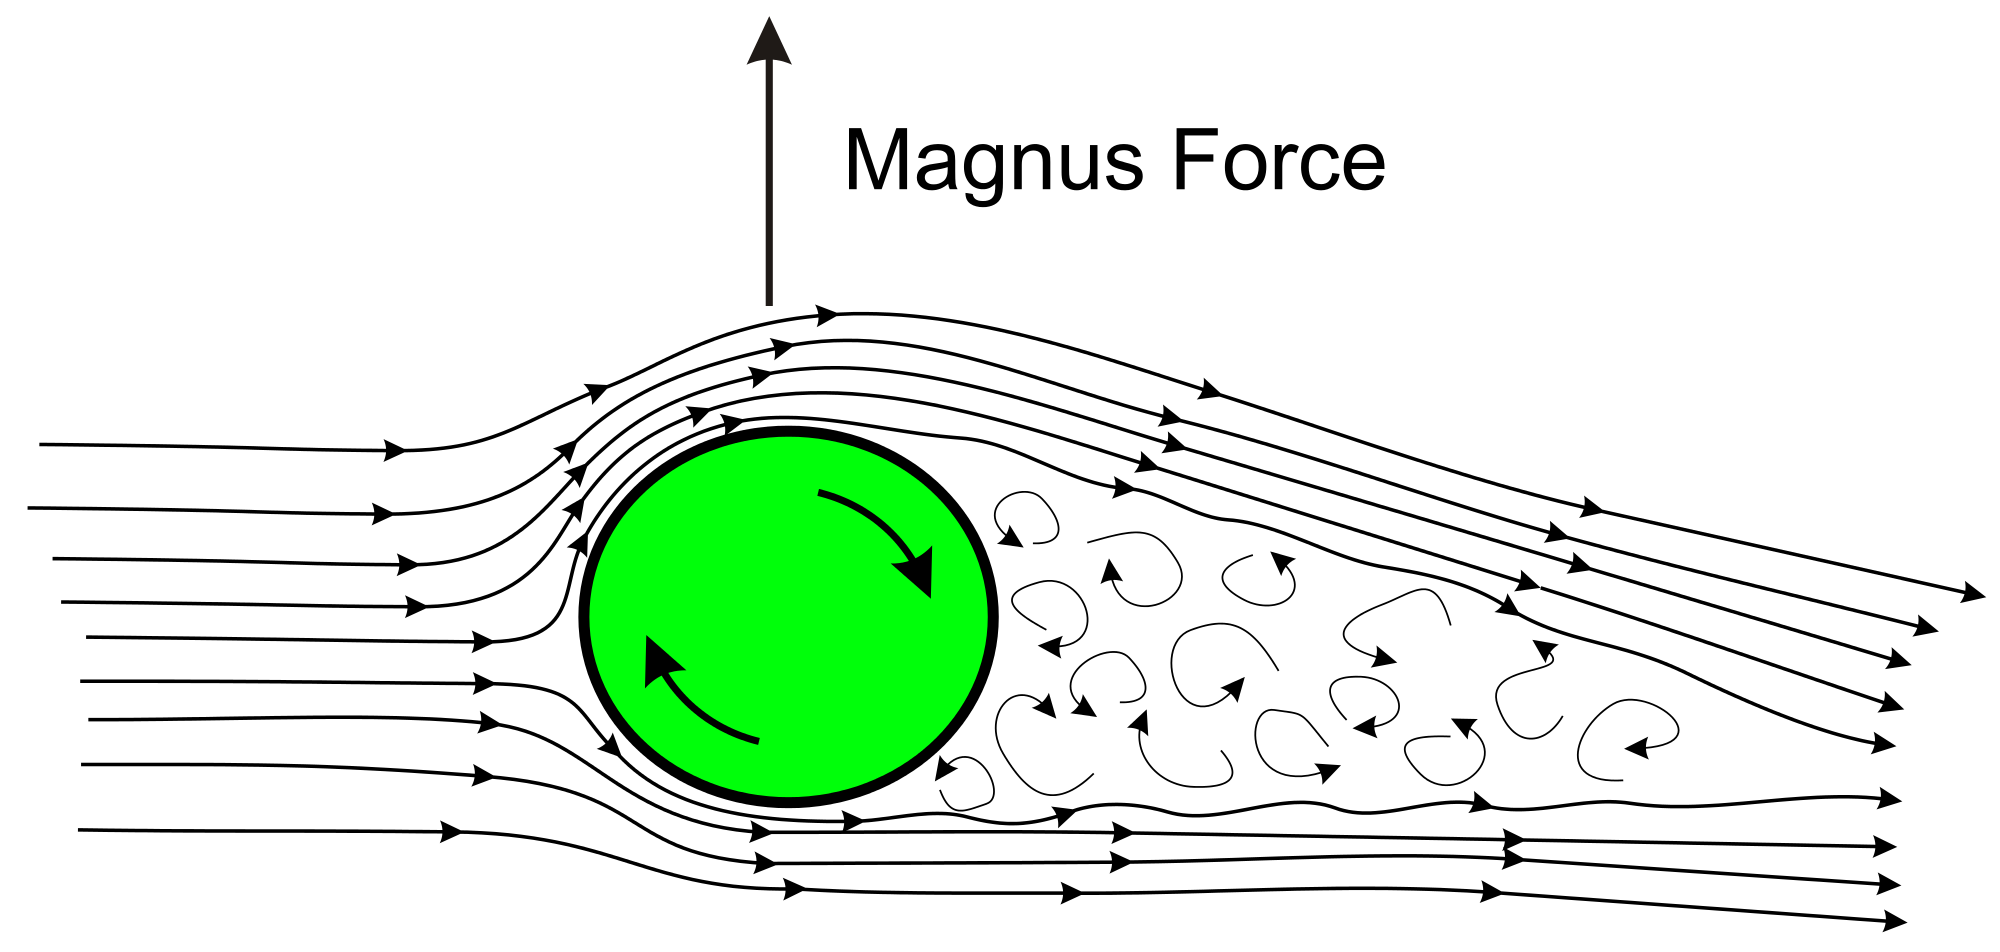 Схема возникновения силы Магнуса